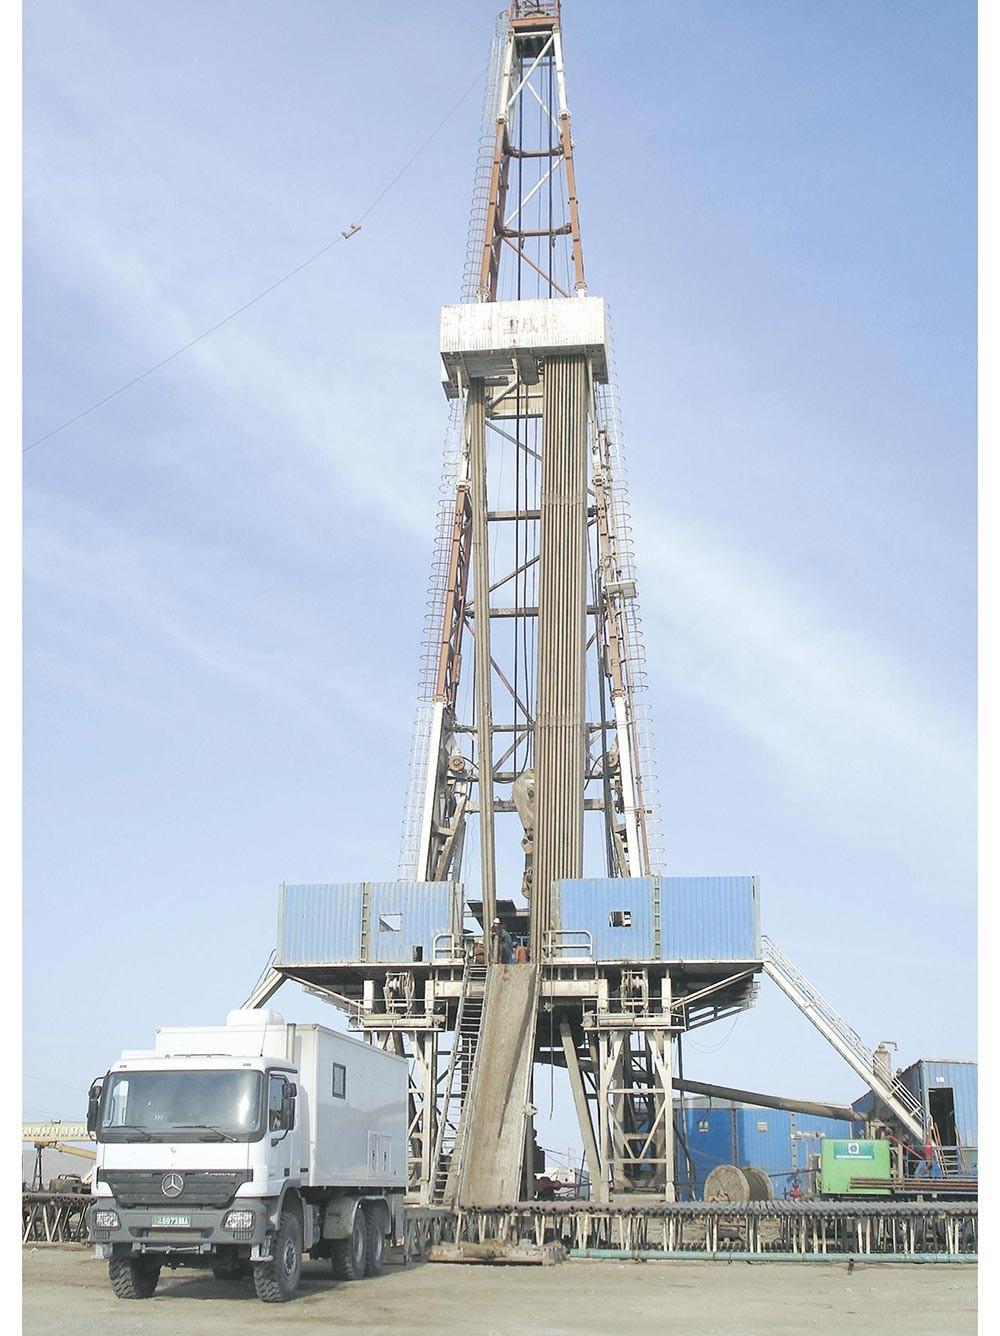 https://www.oilgas.gov.tm/storage/posts/2836/original-161248e16bcf6f.jpeg